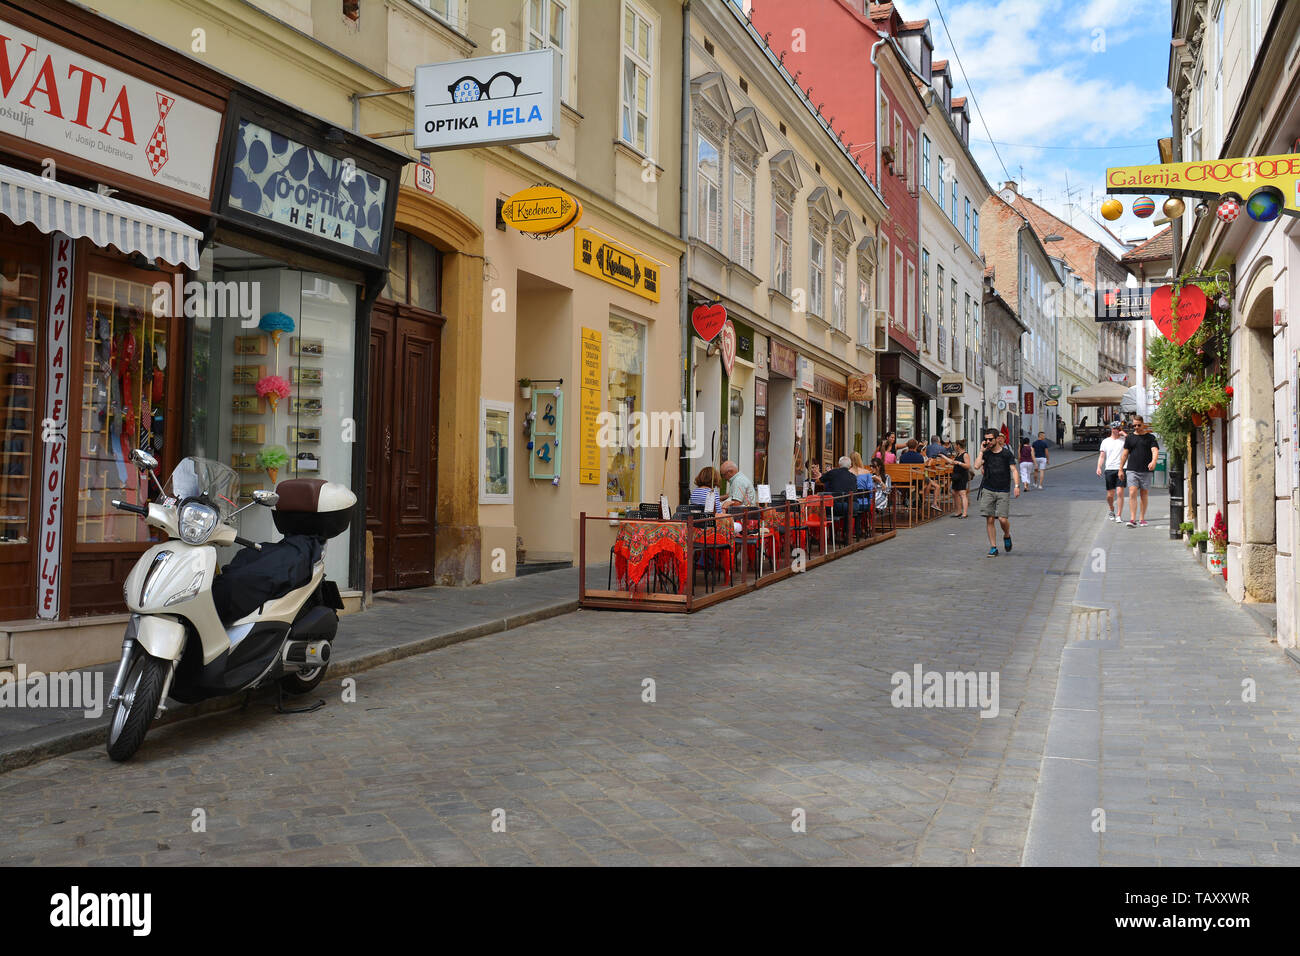 Zagreb Croatia July 15 2017 Radiceva Street View In Old Town Of Zagreb Croatia Stock Photo Alamy